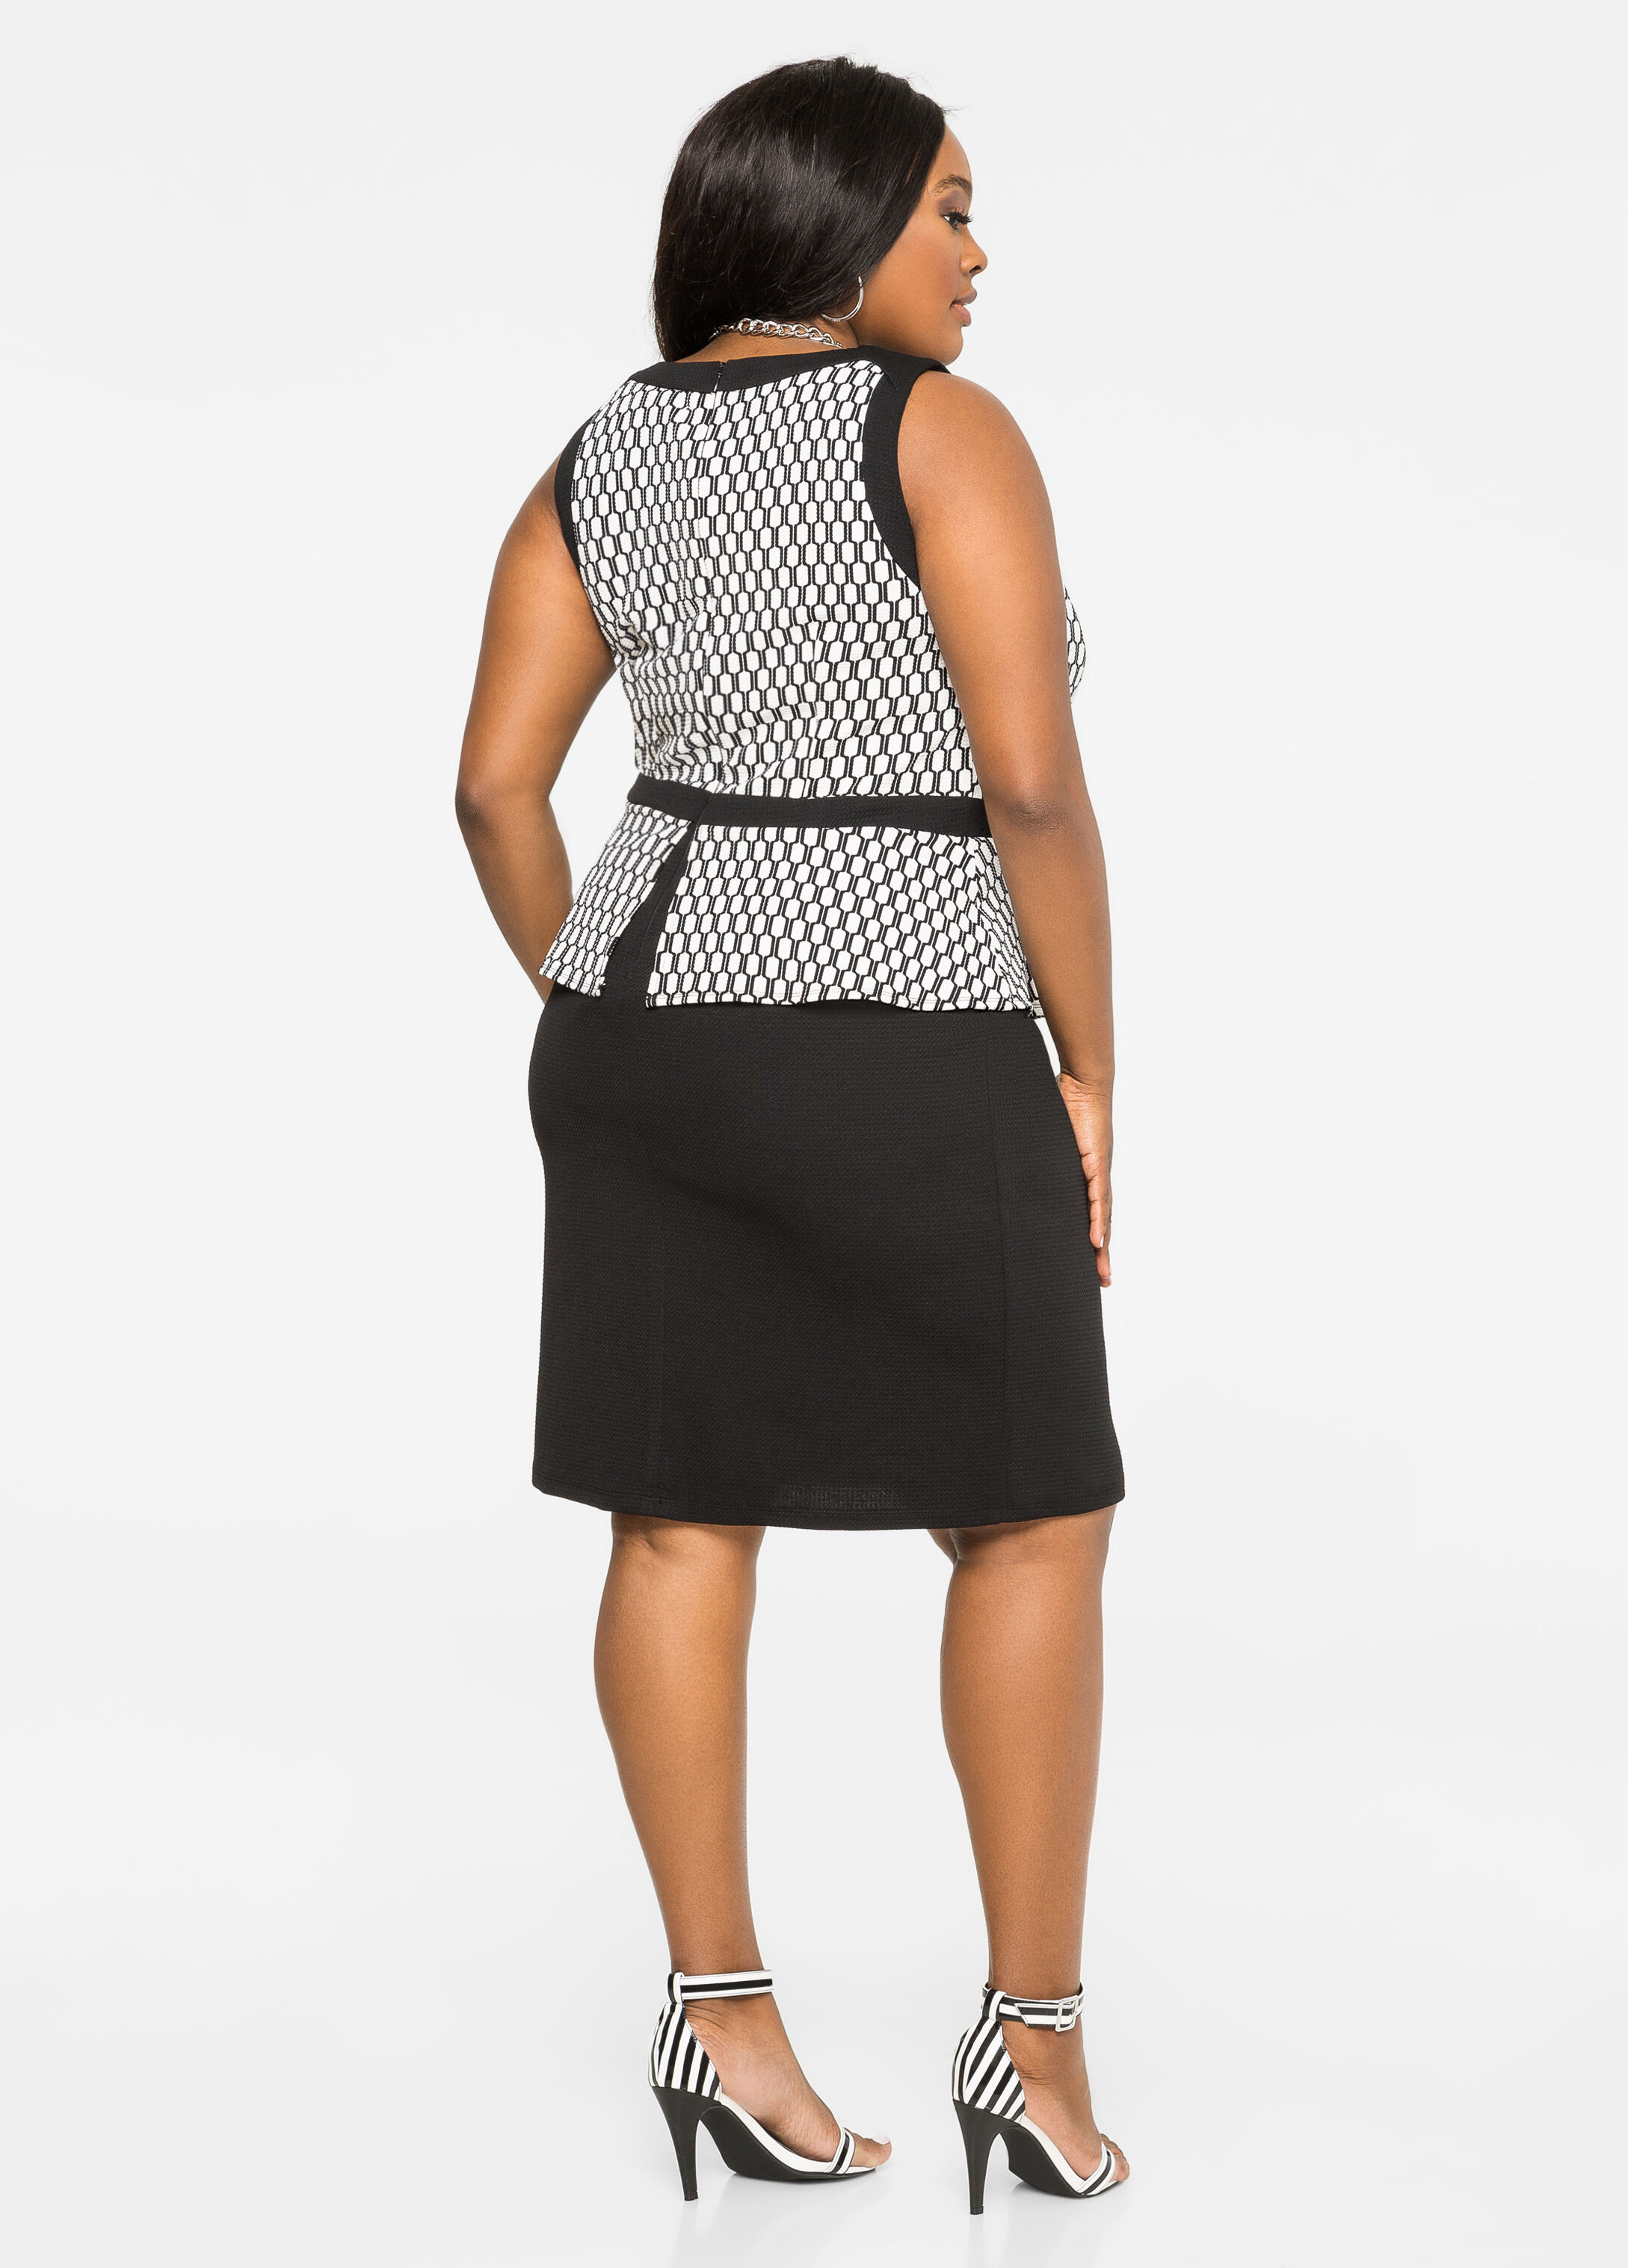 Honeycomb Peplum Dress